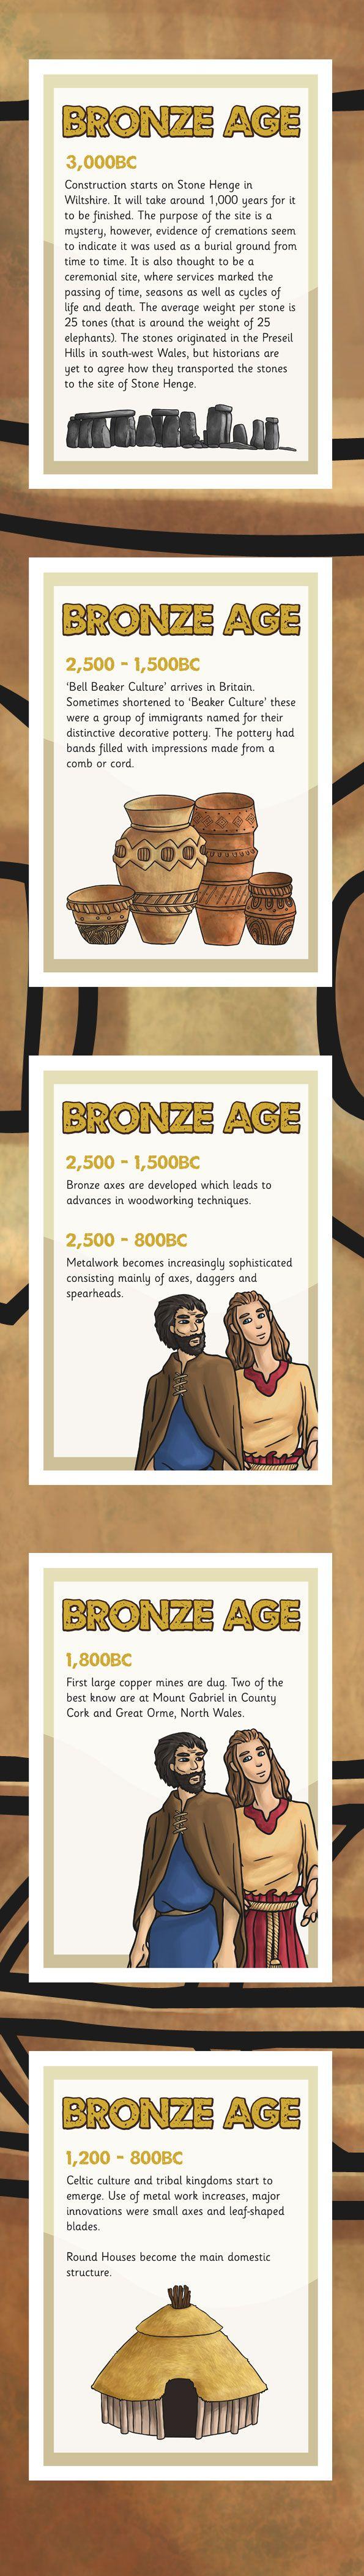 KS2 History Timelines- Bronze Age Timeline Posters                                                                                                                                                                                 More